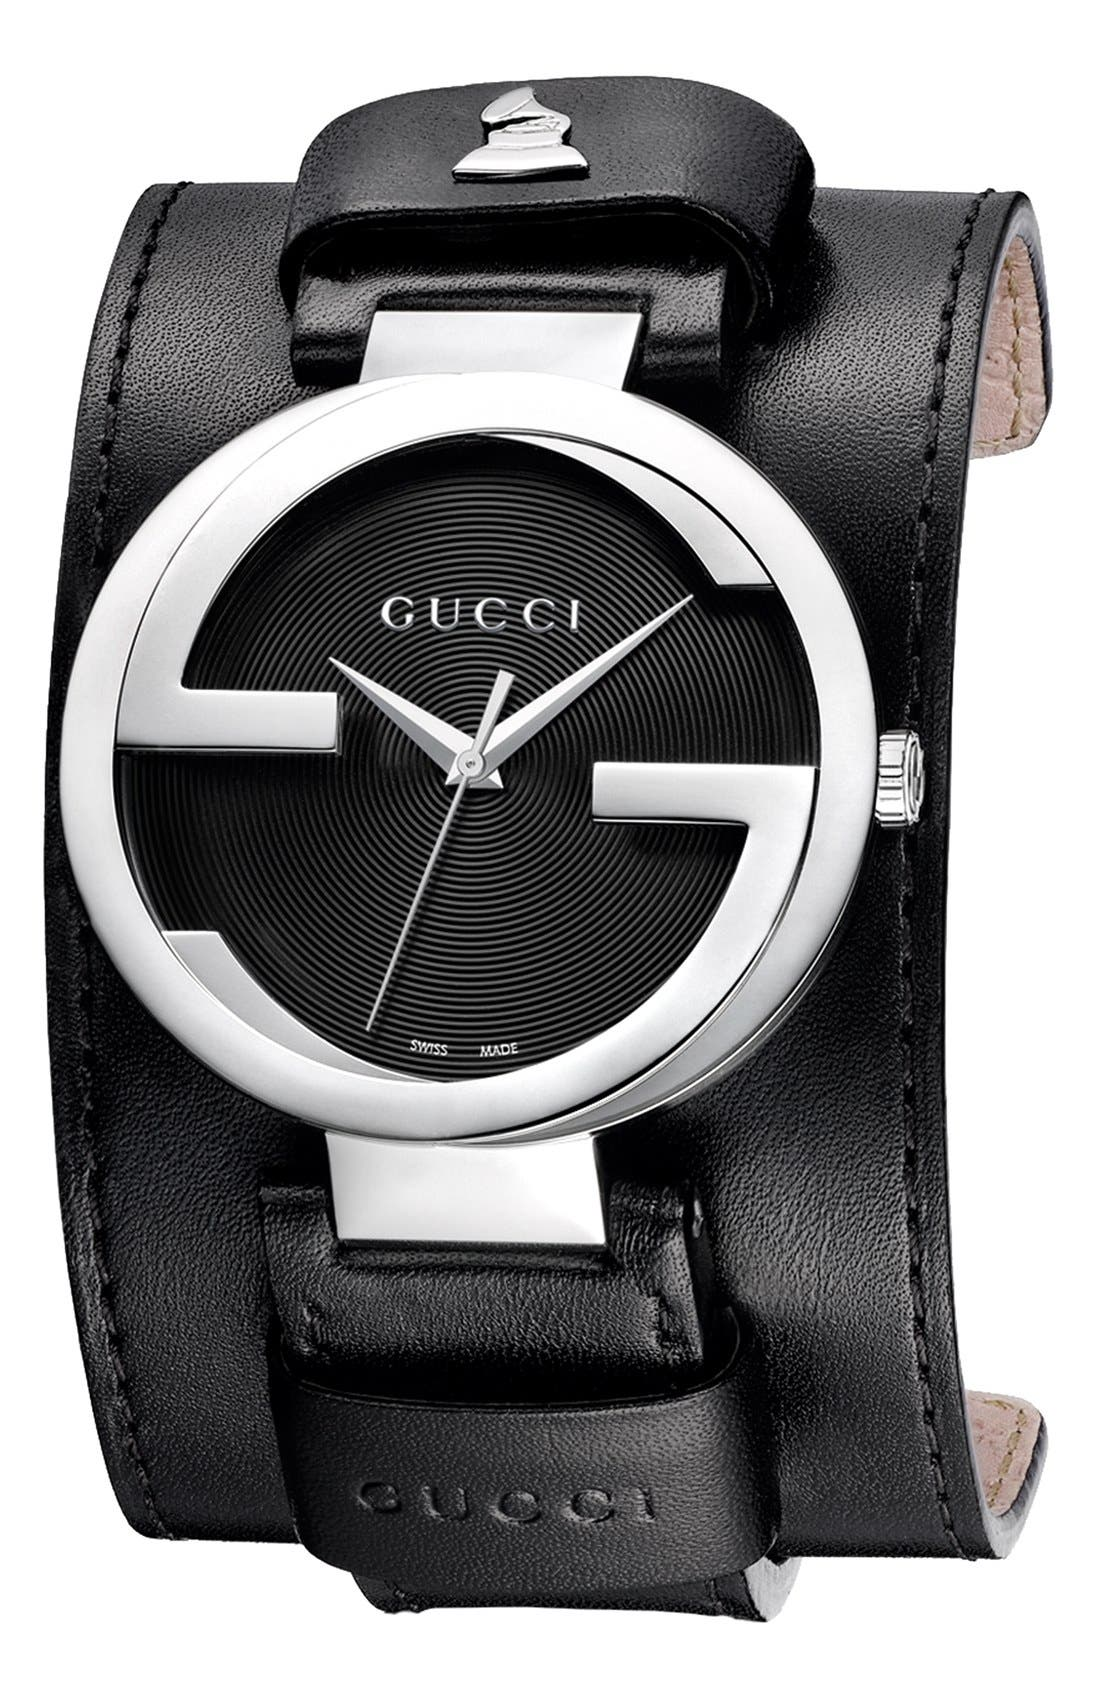 Main Image - Gucci 'Interlocking G - GRAMMY®' Leather Cuff Watch, 42mm